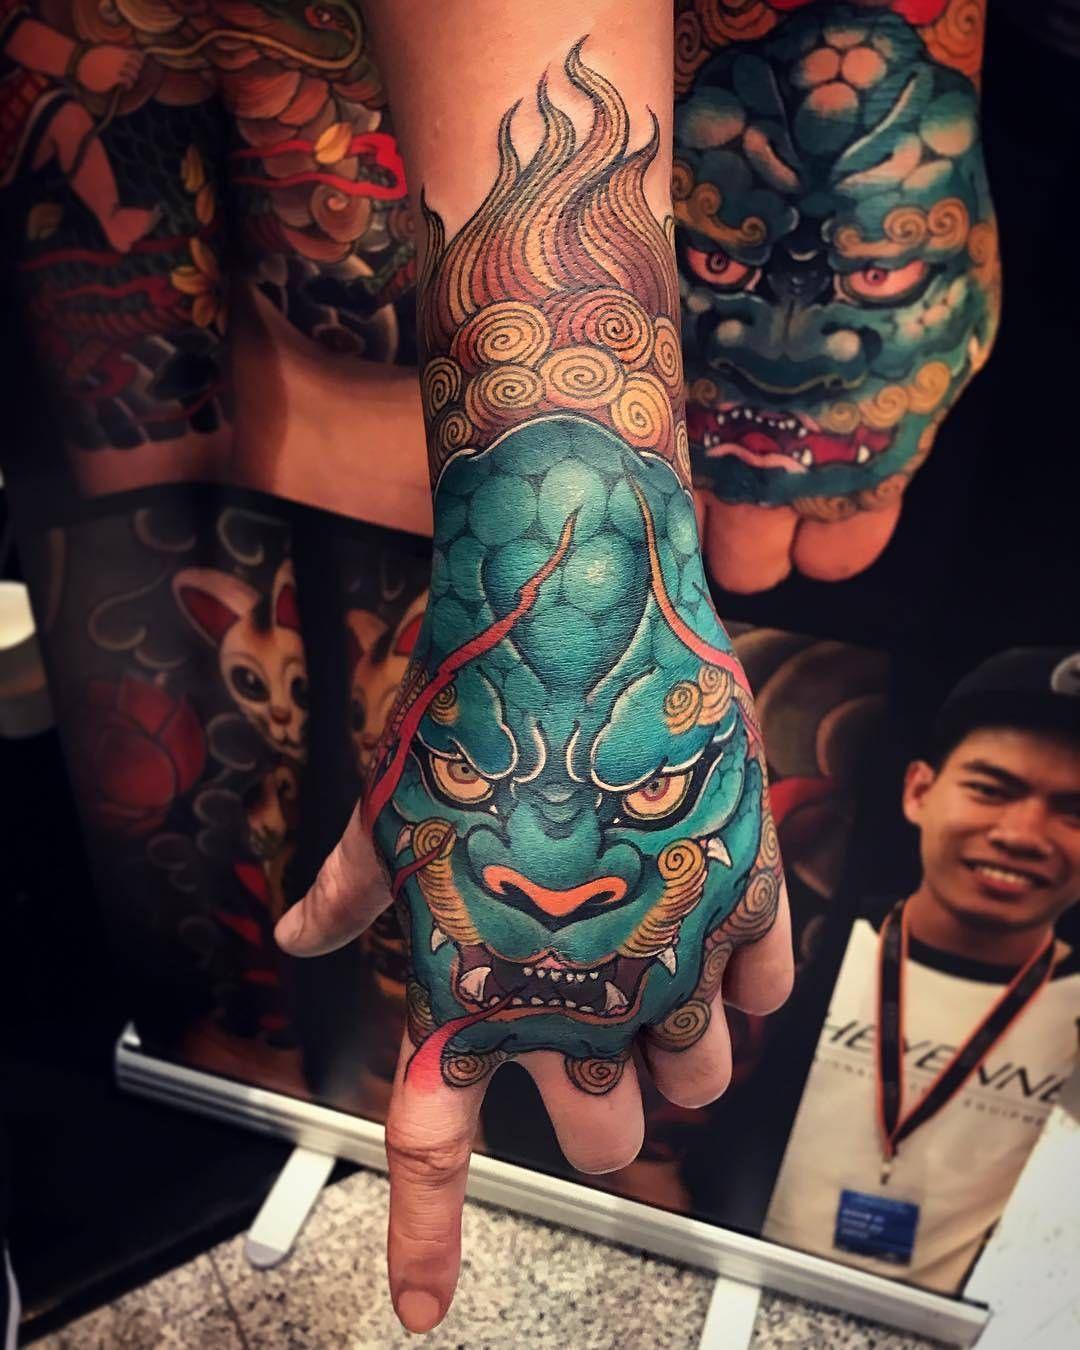 Pin By Maverick Acevedo Velazquez On Tattoo Japan Japanese Hand Tattoos Hand Tattoos Dragon Hand Tattoo